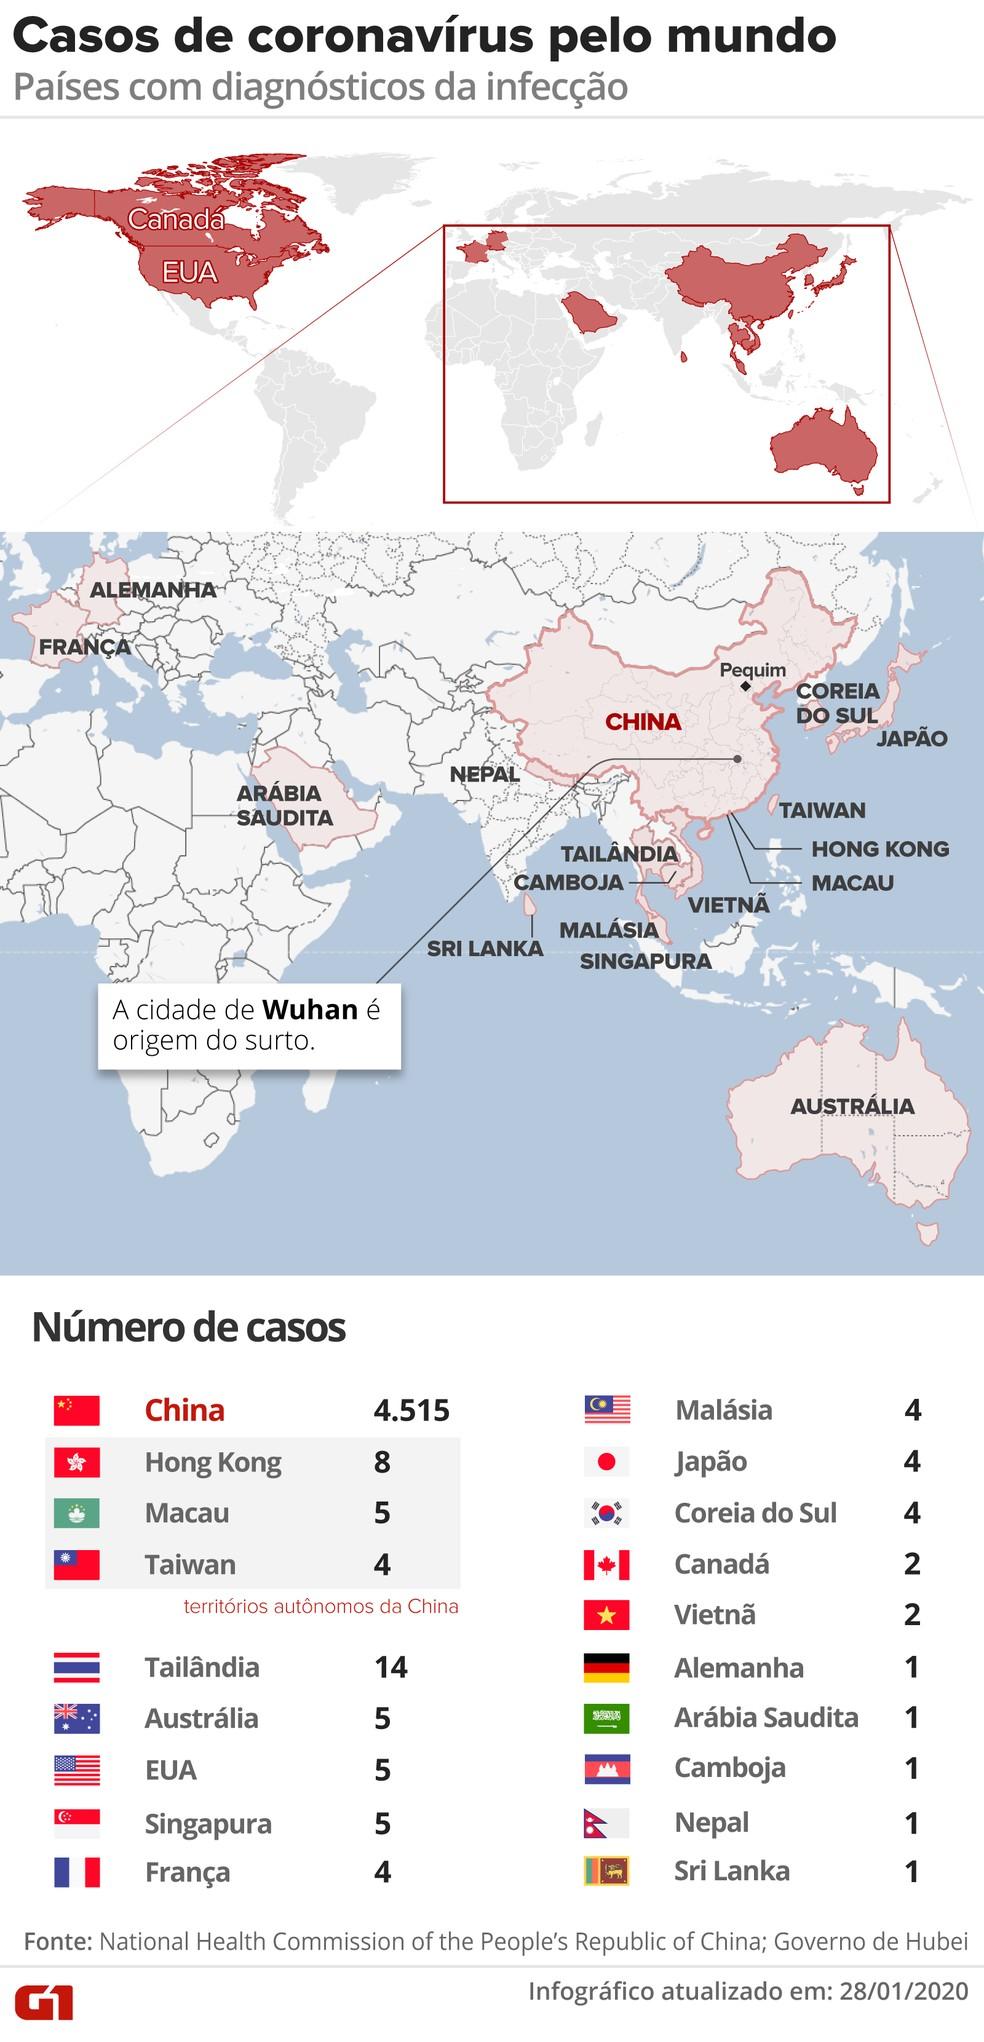 mapa-coronavirus-paises.png